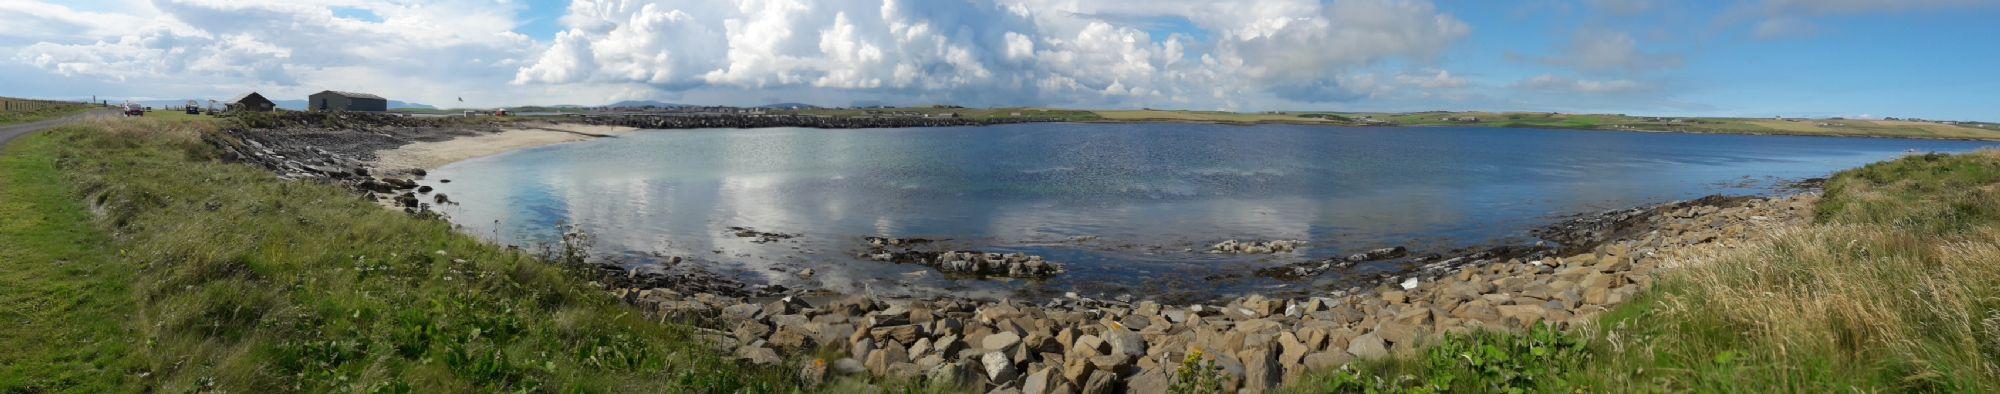 Lamb Holm overlooking mainland